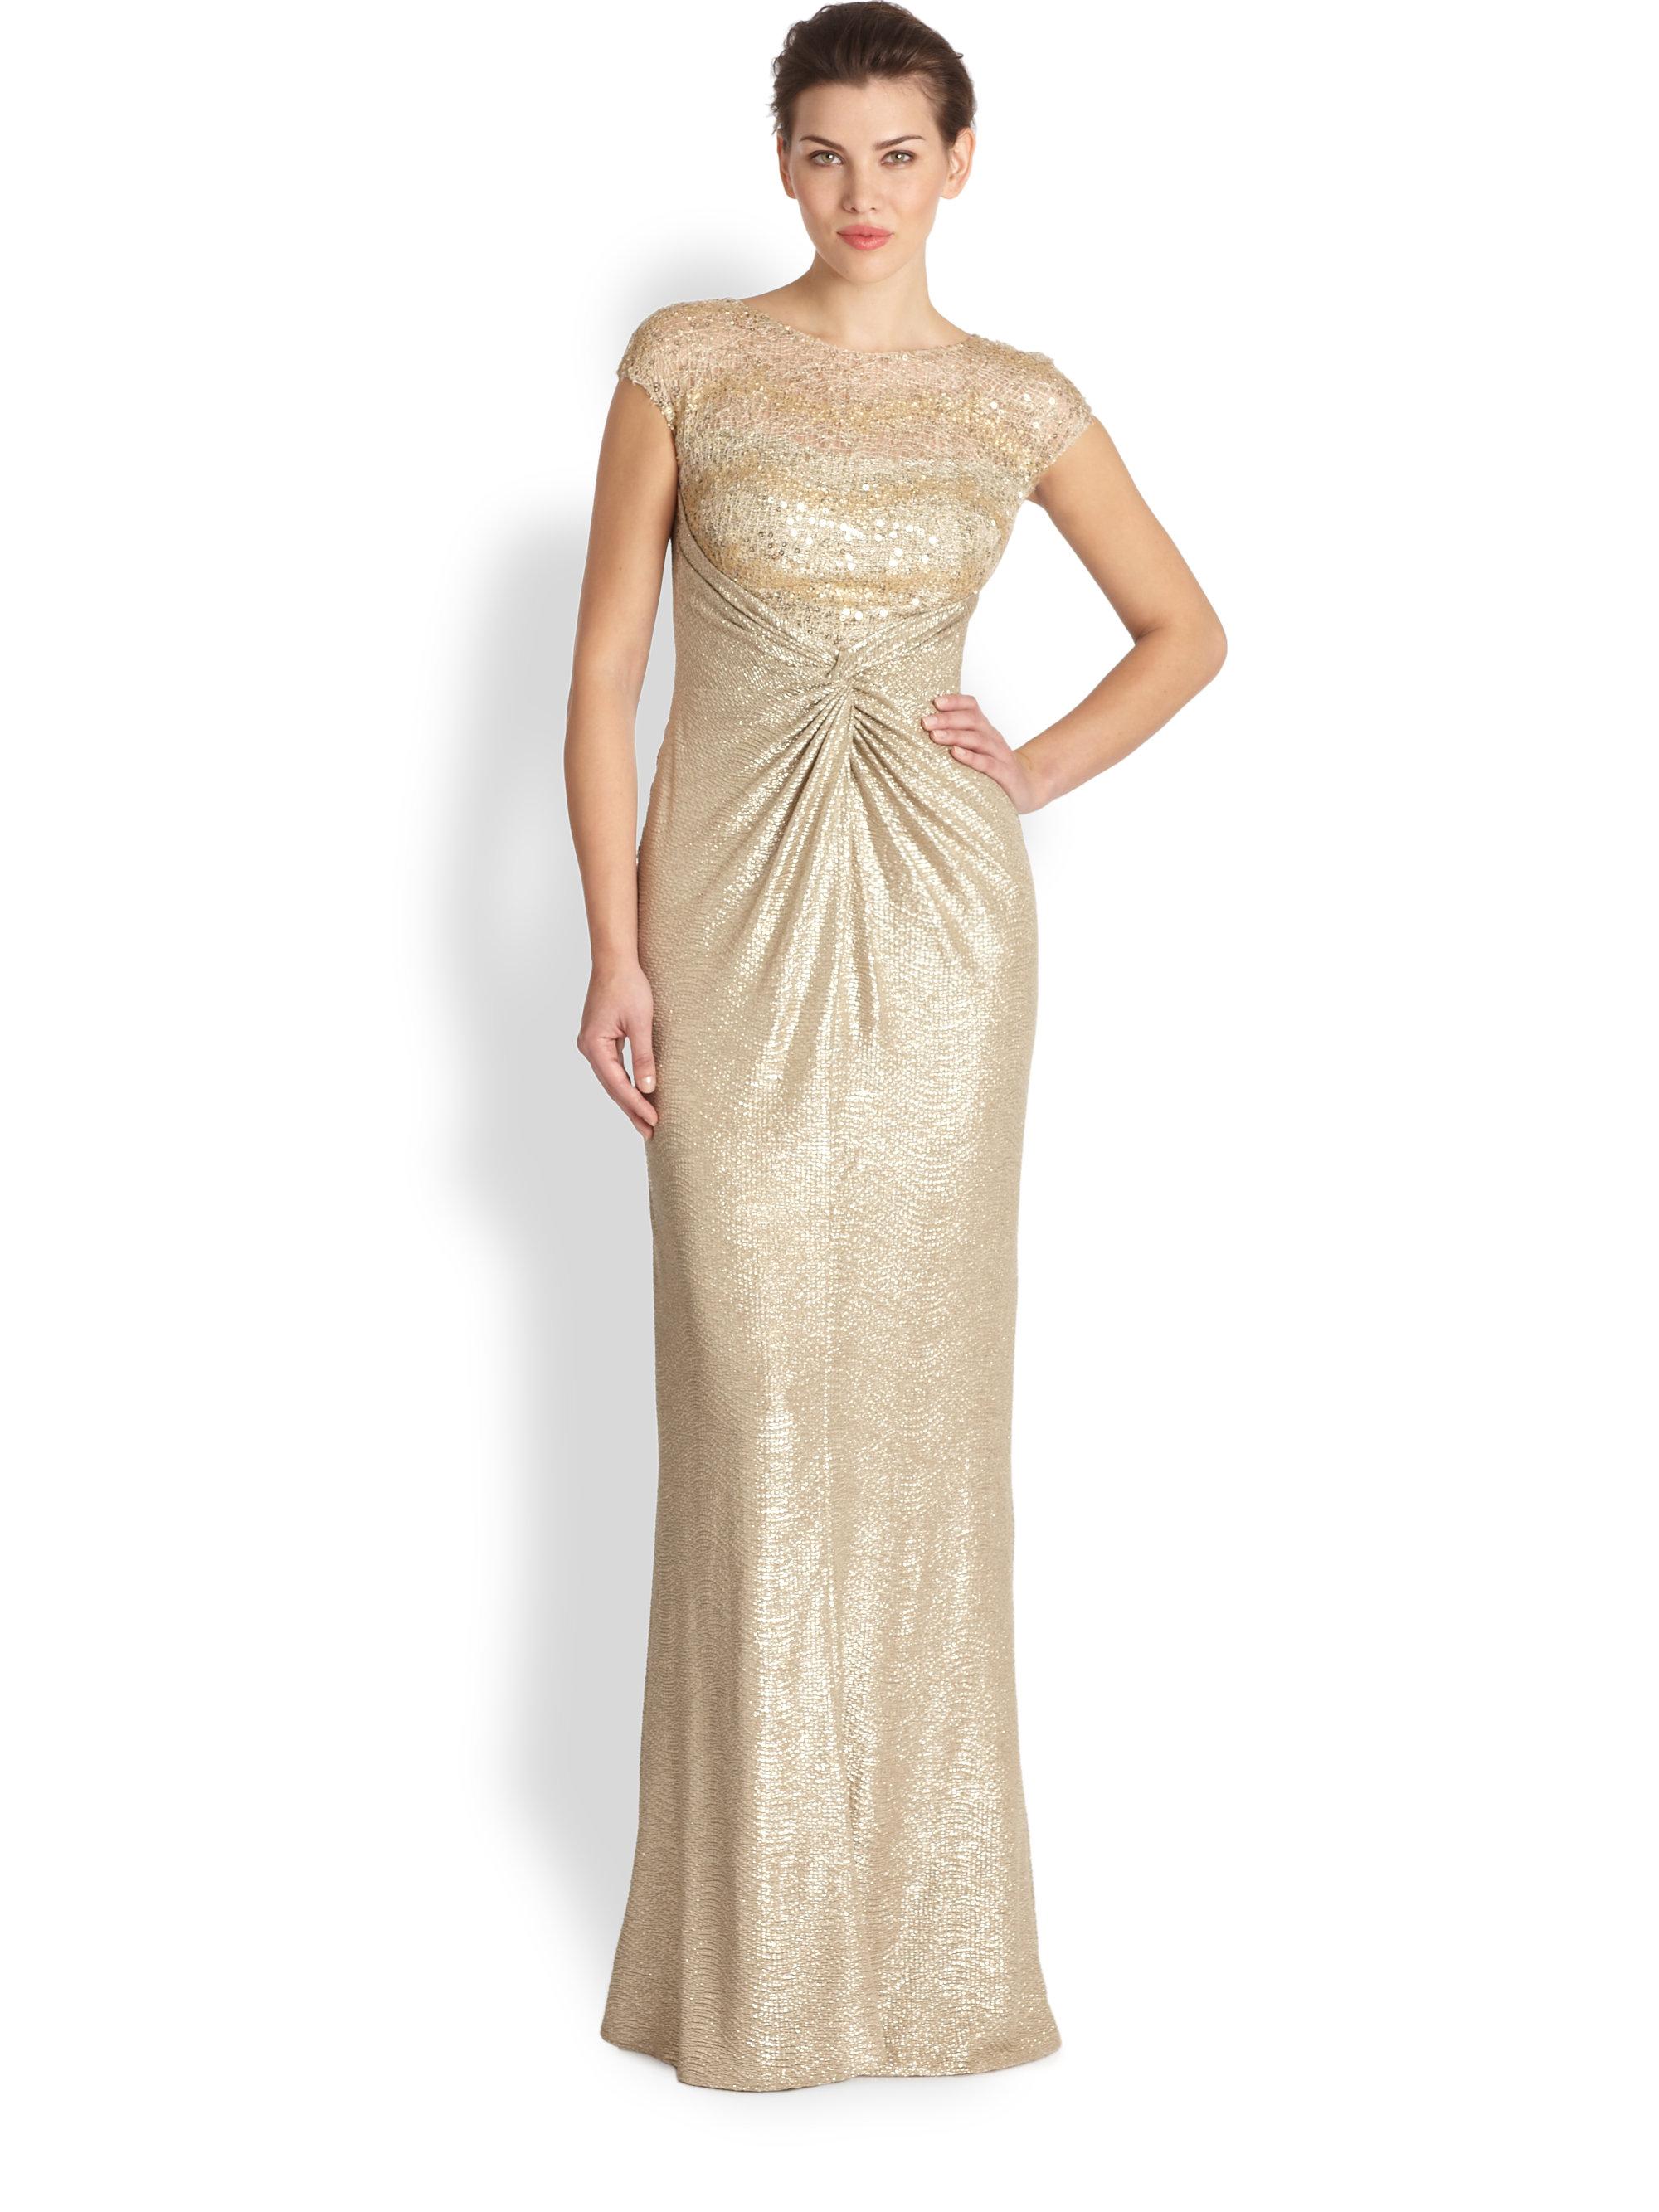 Lyst - David Meister Sequin Lace & Metallic Crepe Gown in Metallic